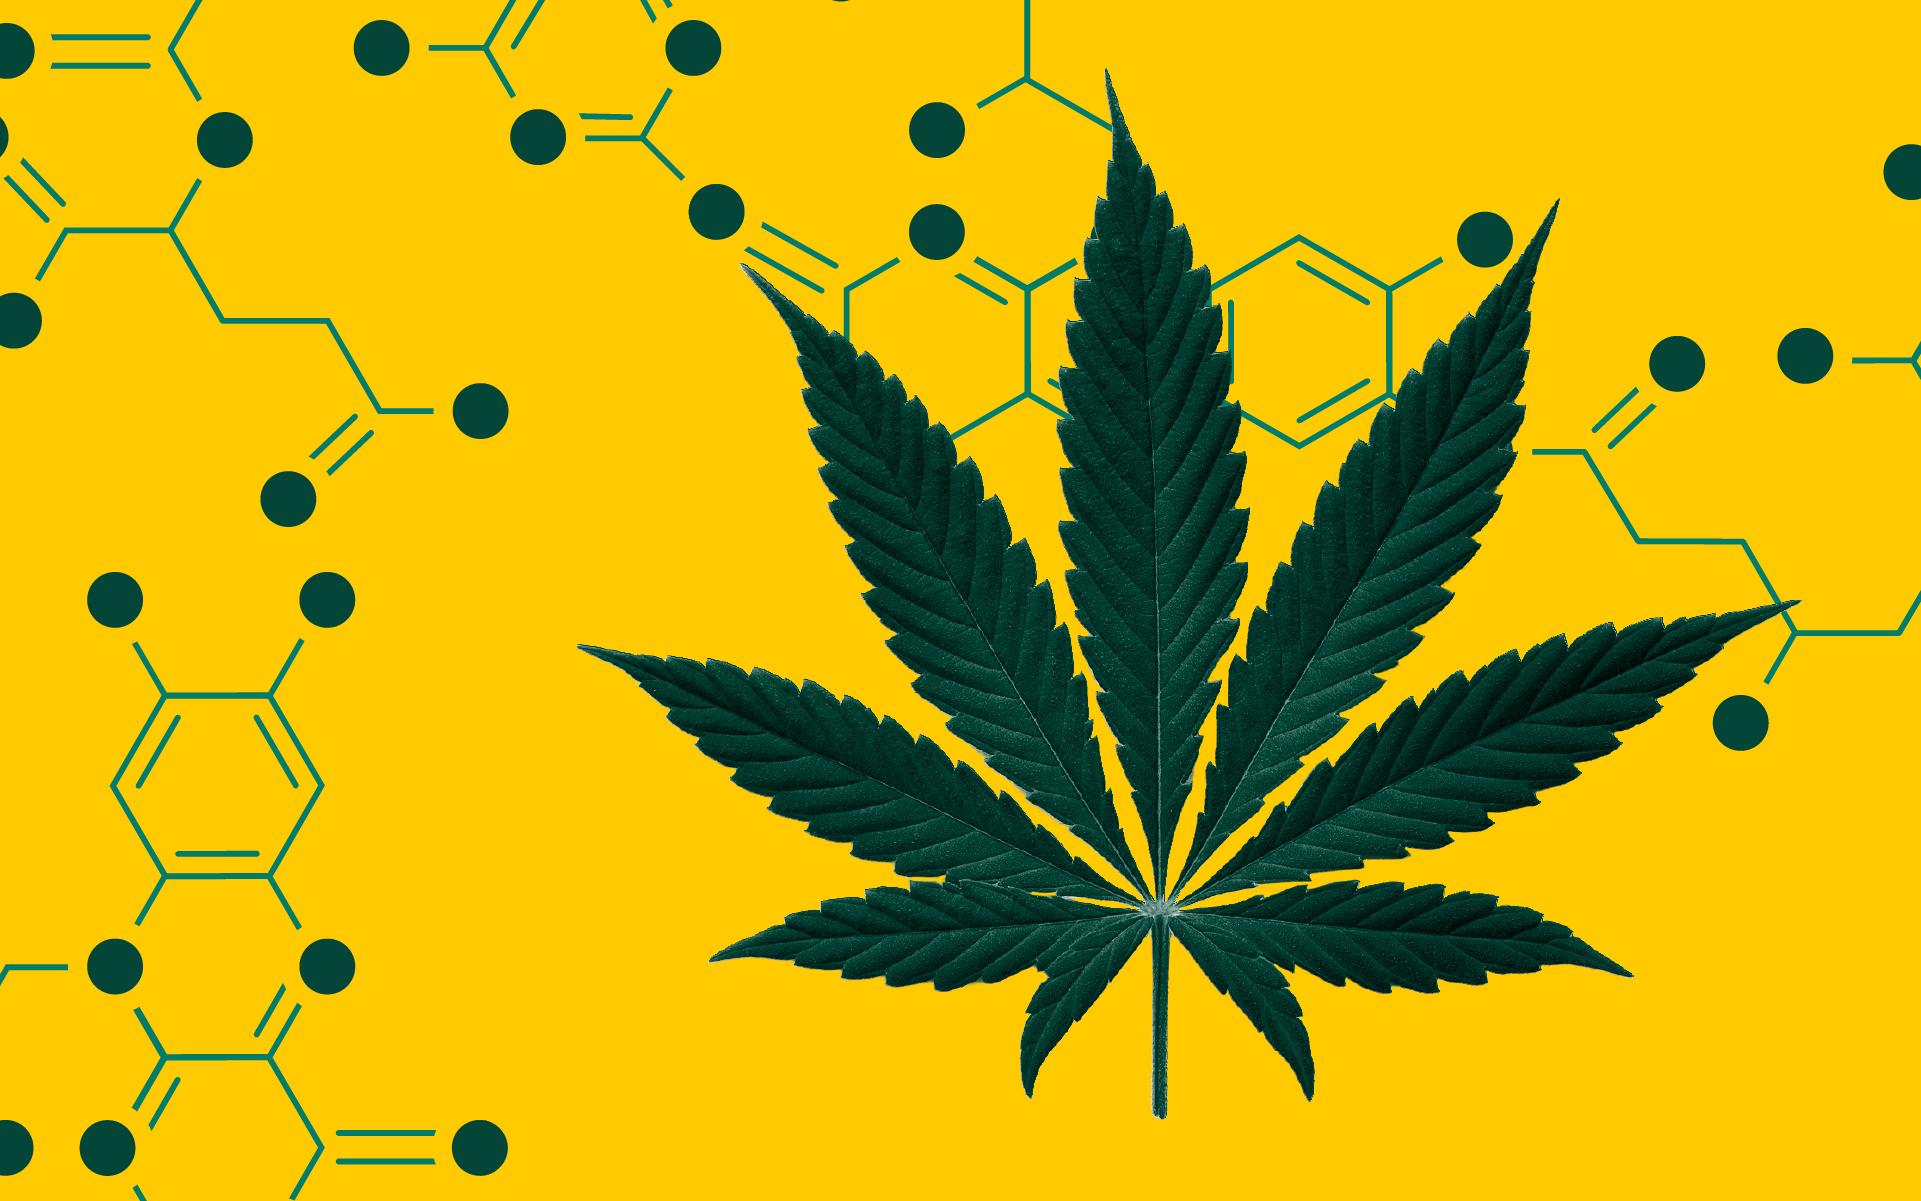 Naukowcy Zidentyfikowali Nowy Cannabinoid: THCP, GanjaFarmer, Ganja Farmer